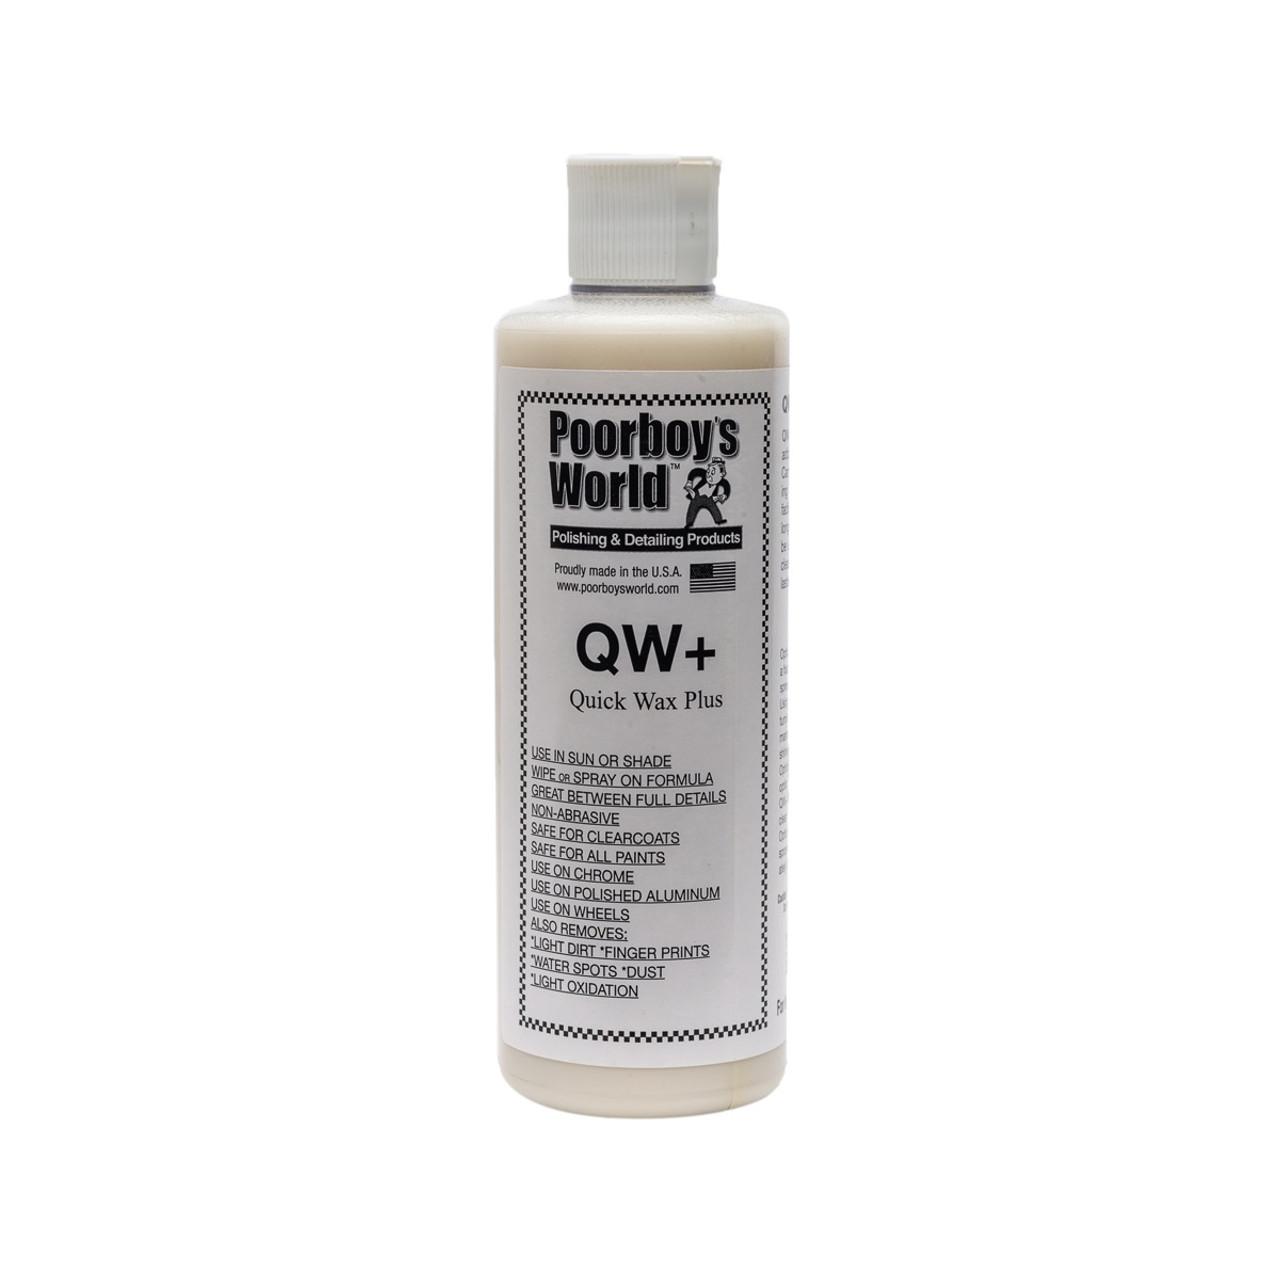 Poorboy's World QW+ Quick Wax 16oz